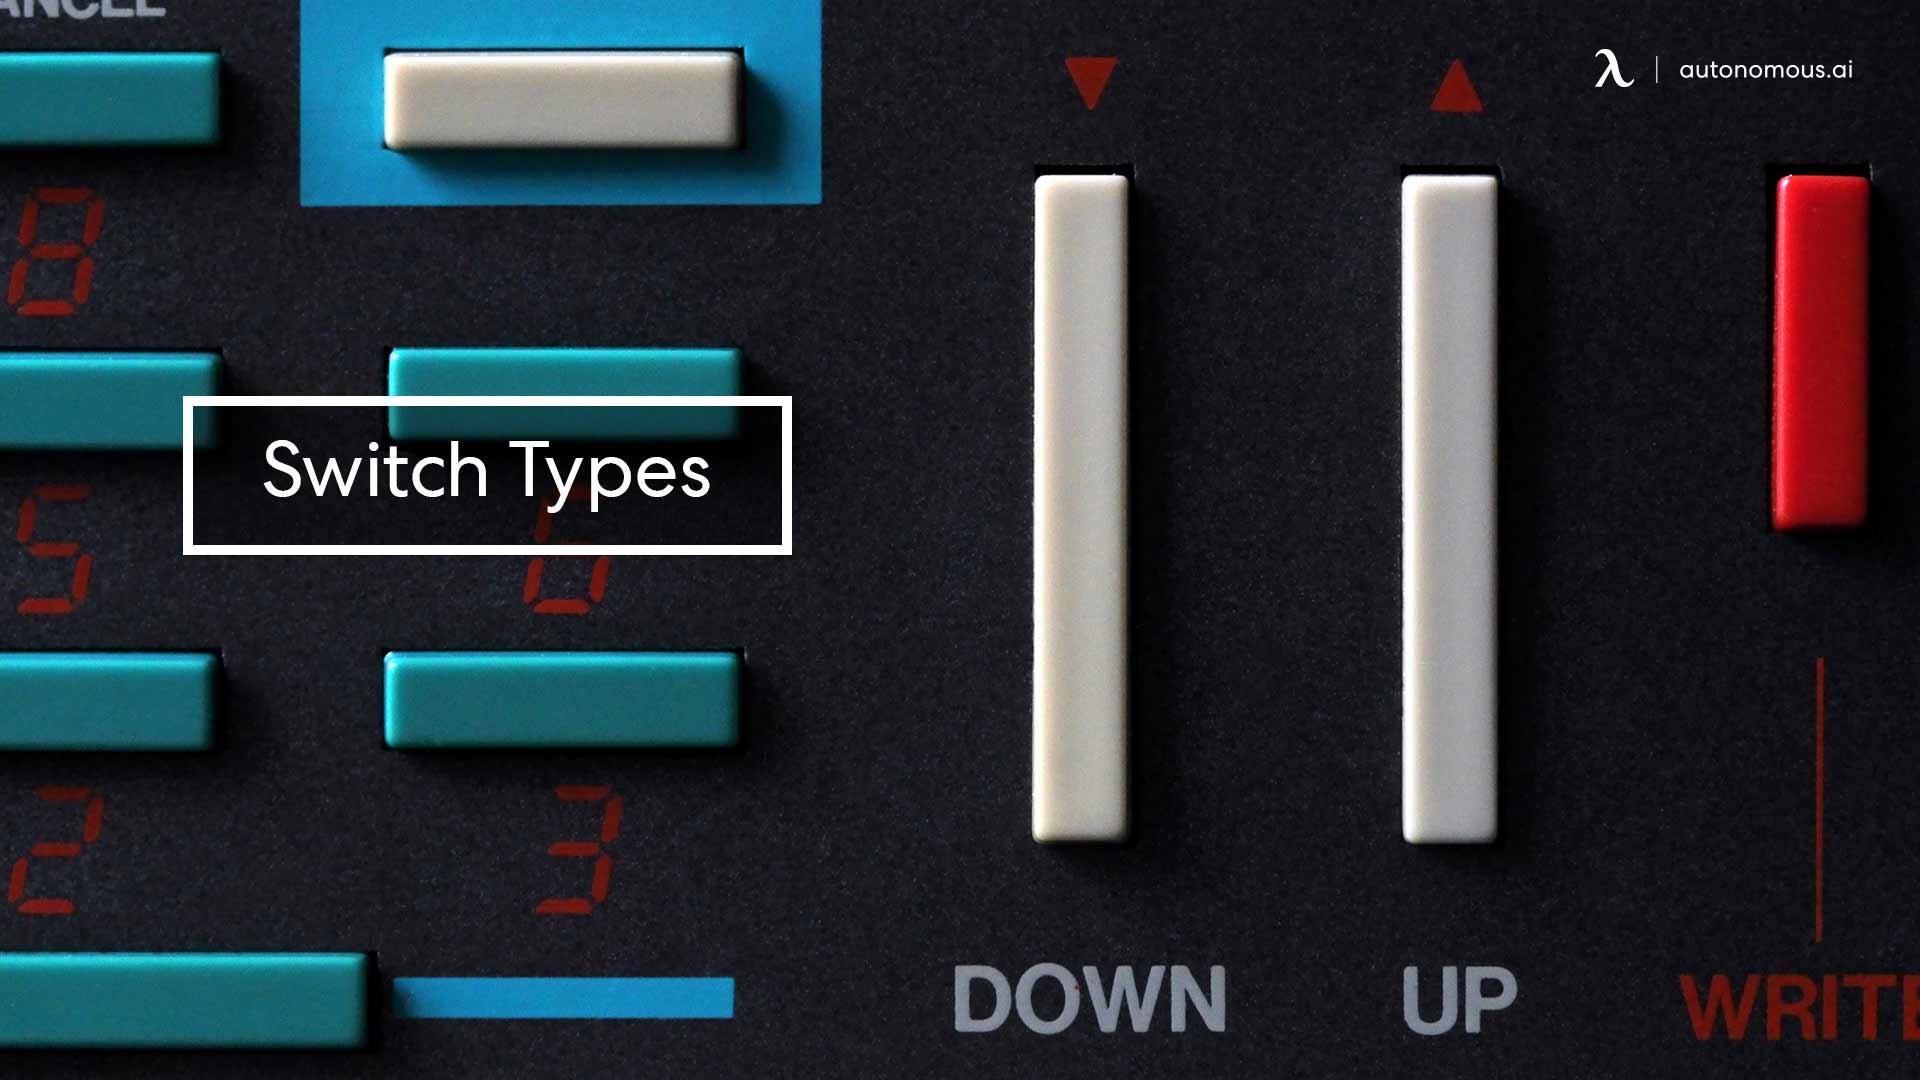 Photo of ergonomic keyboard switch types